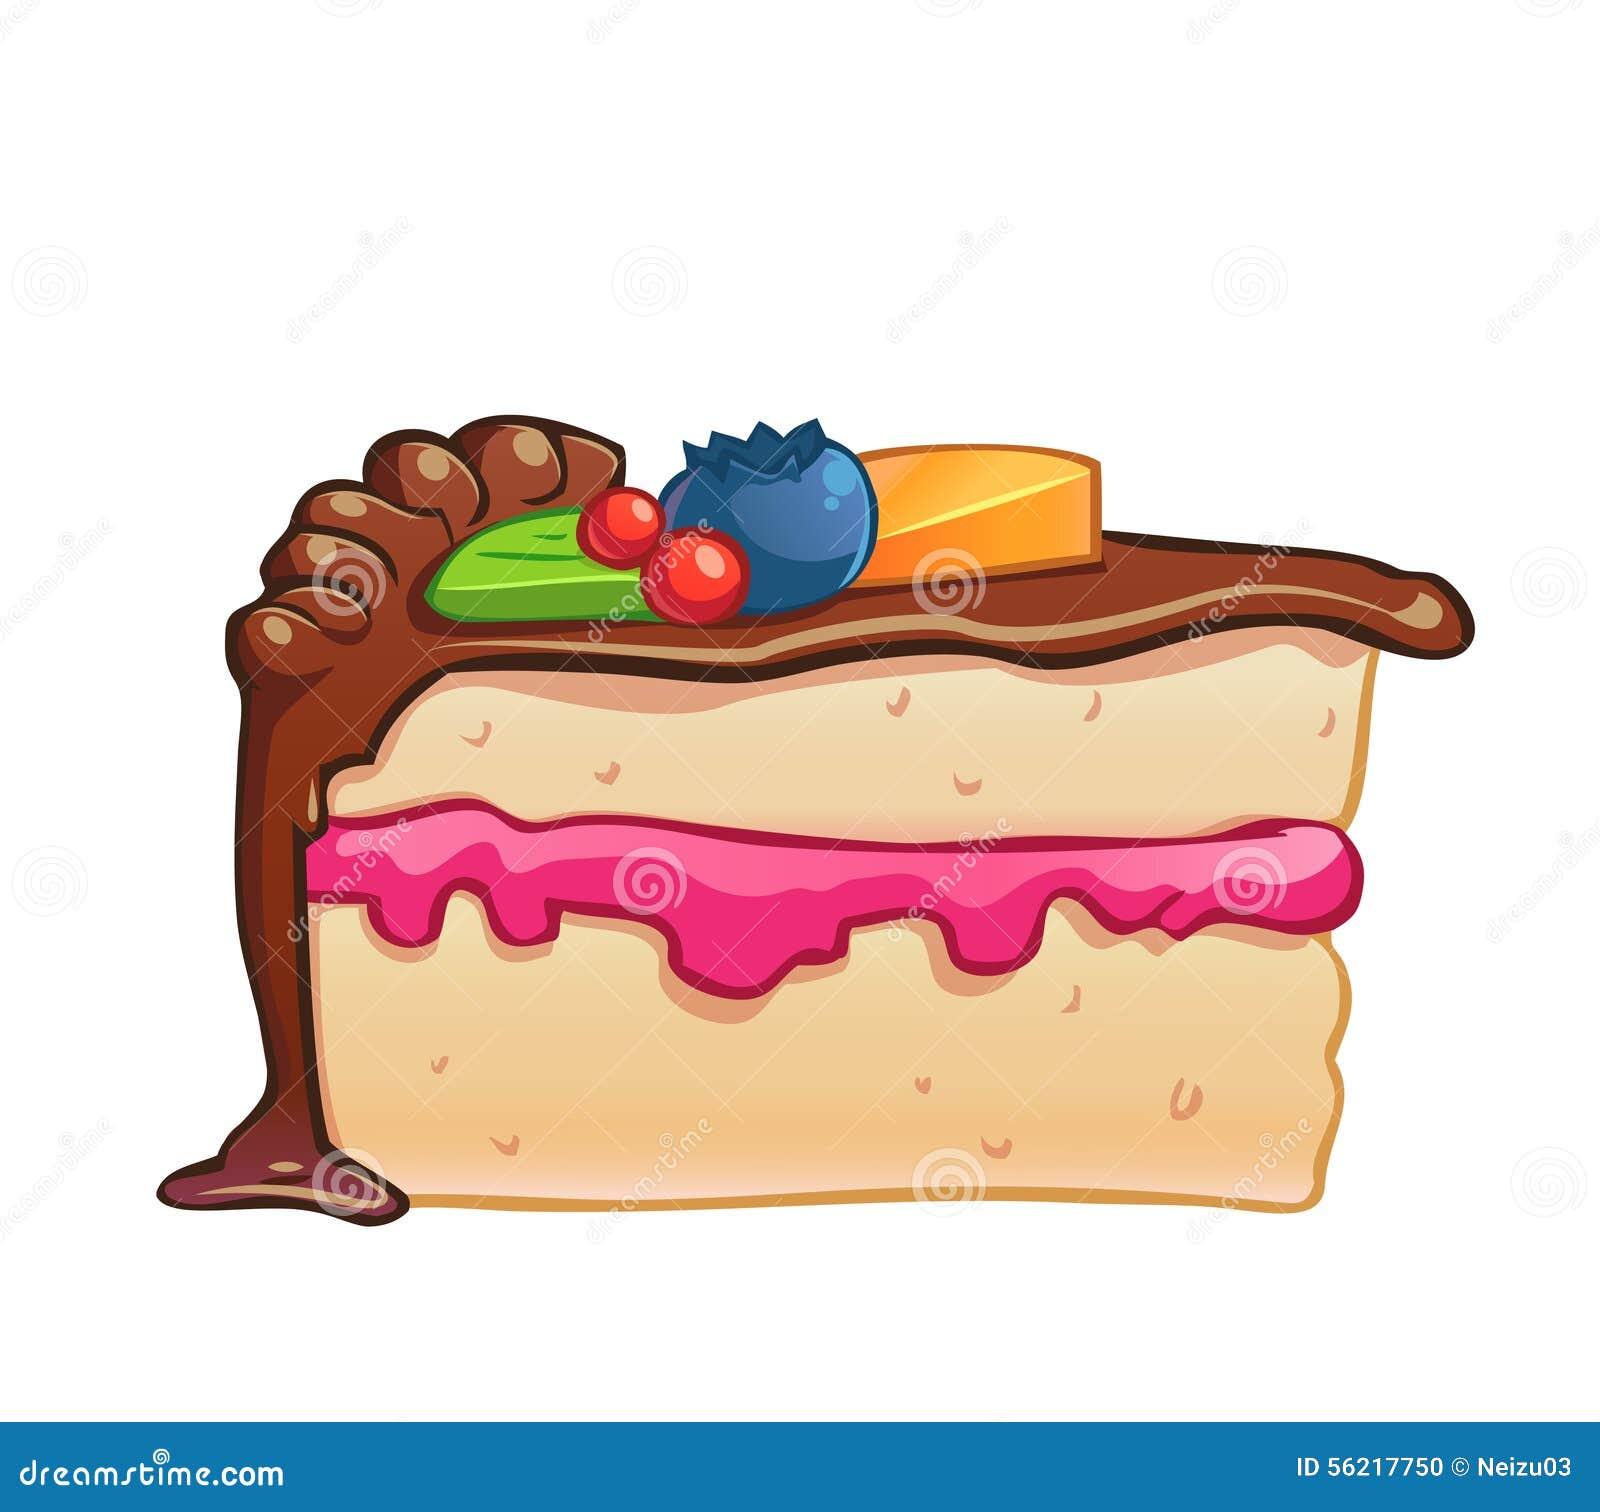 Cute Cake Animation No White Background